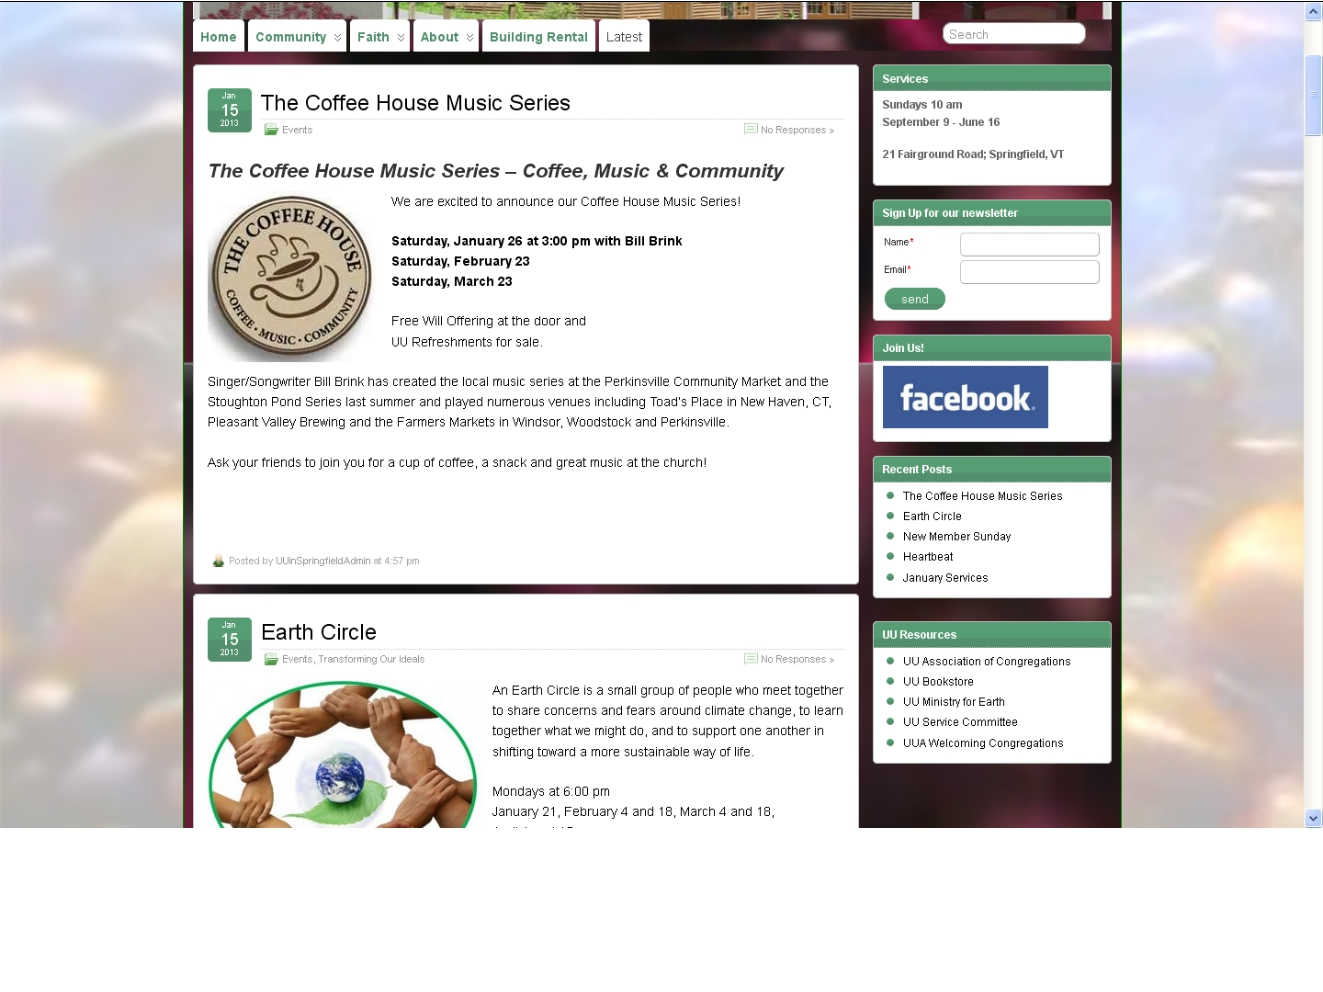 Church website news page